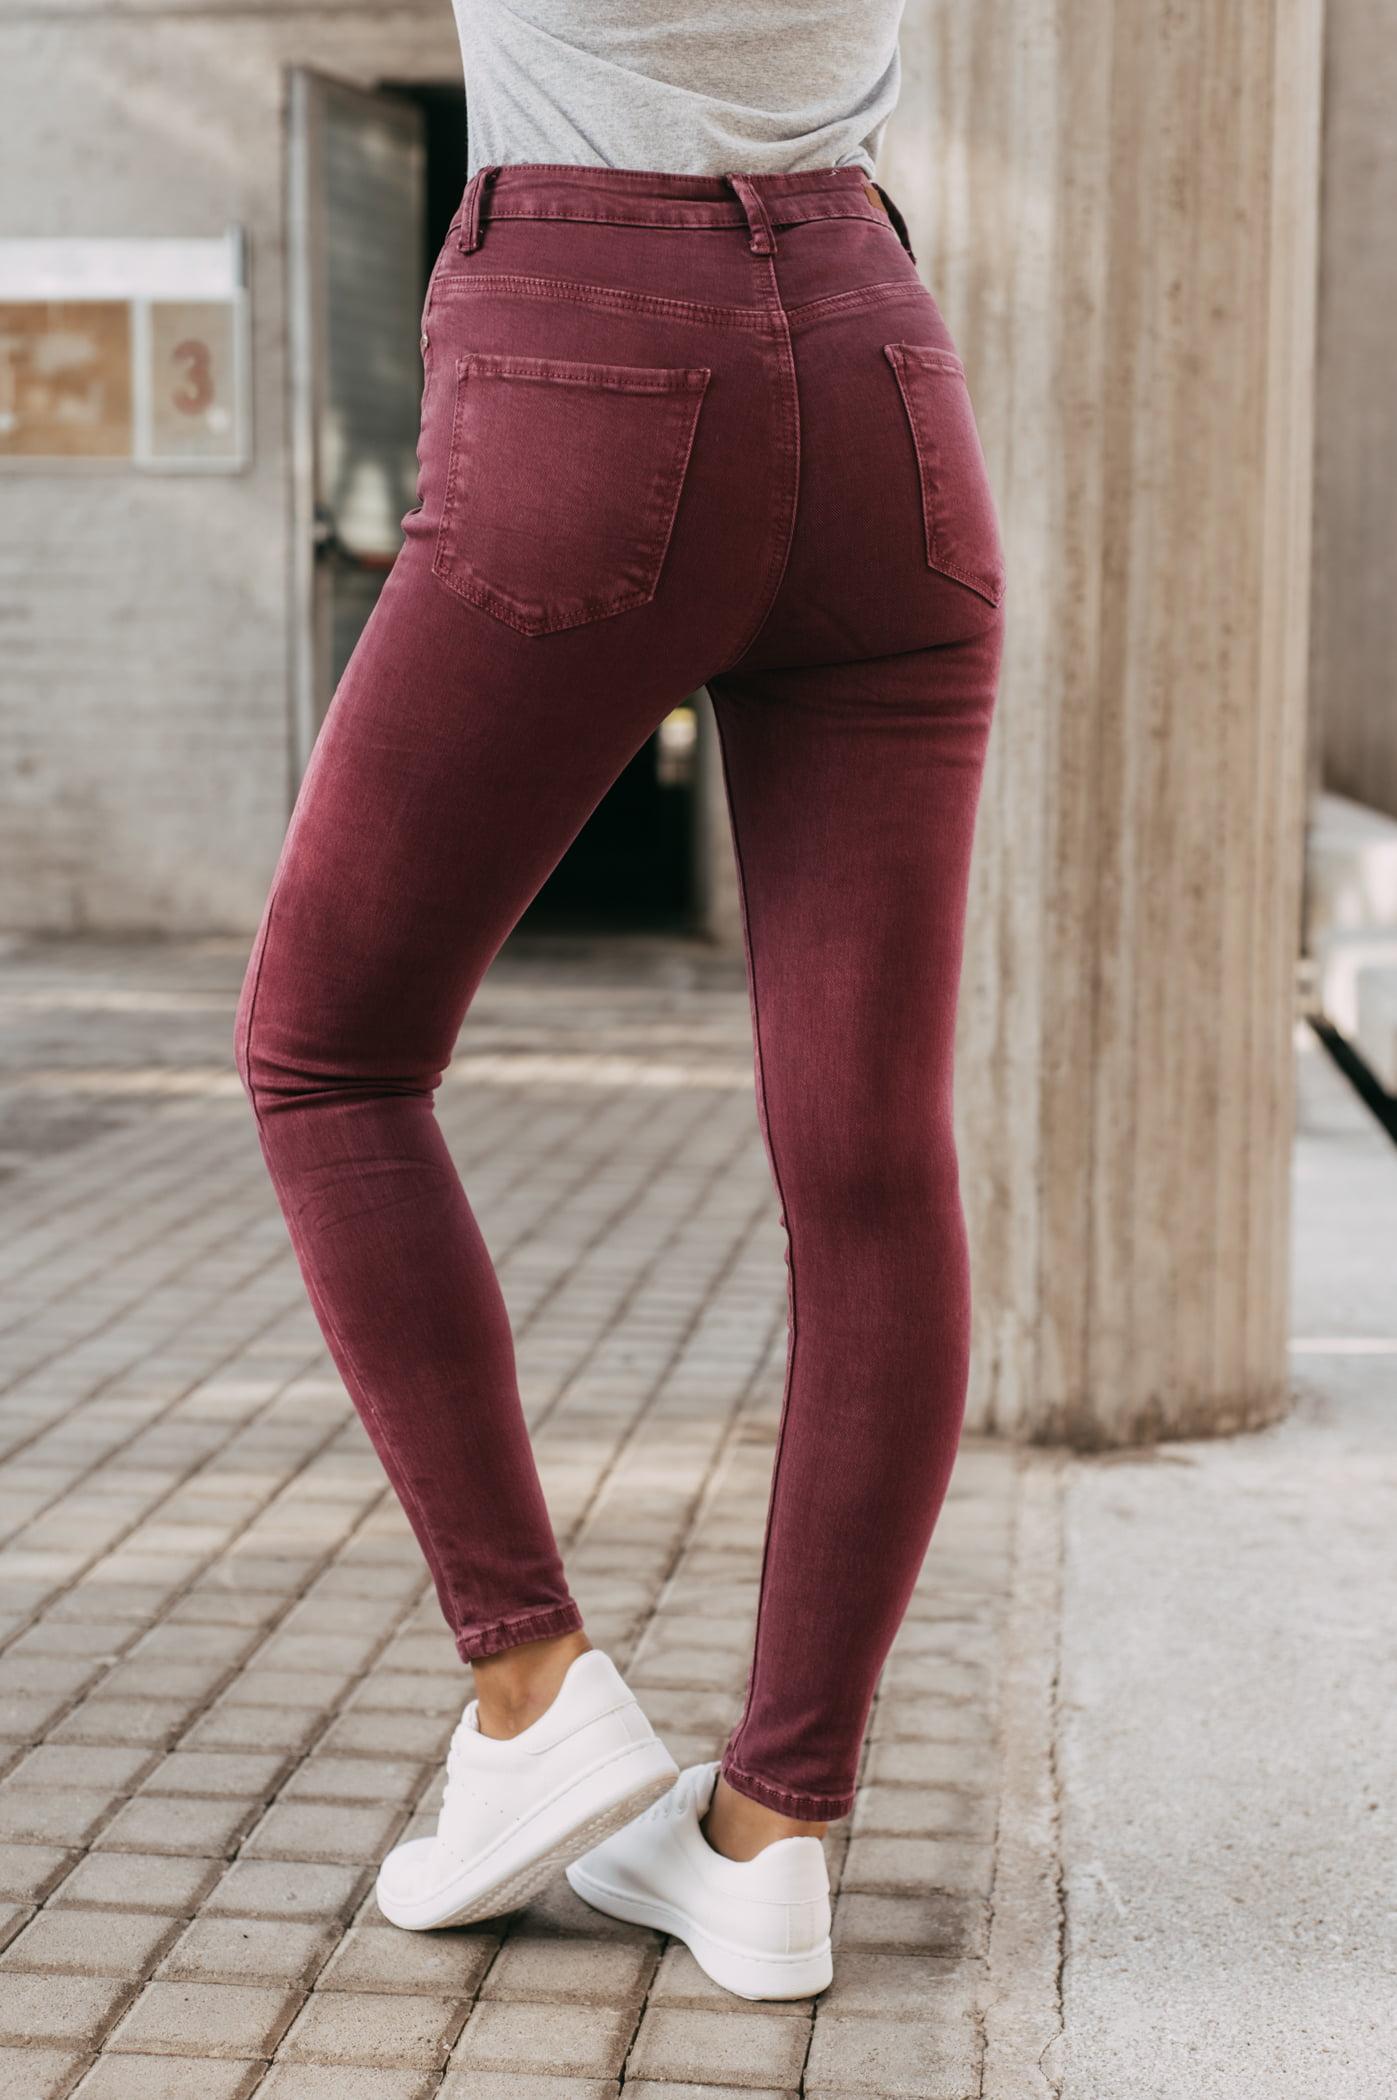 antithesis-clothing-jean-panteloni-mpornto (5)